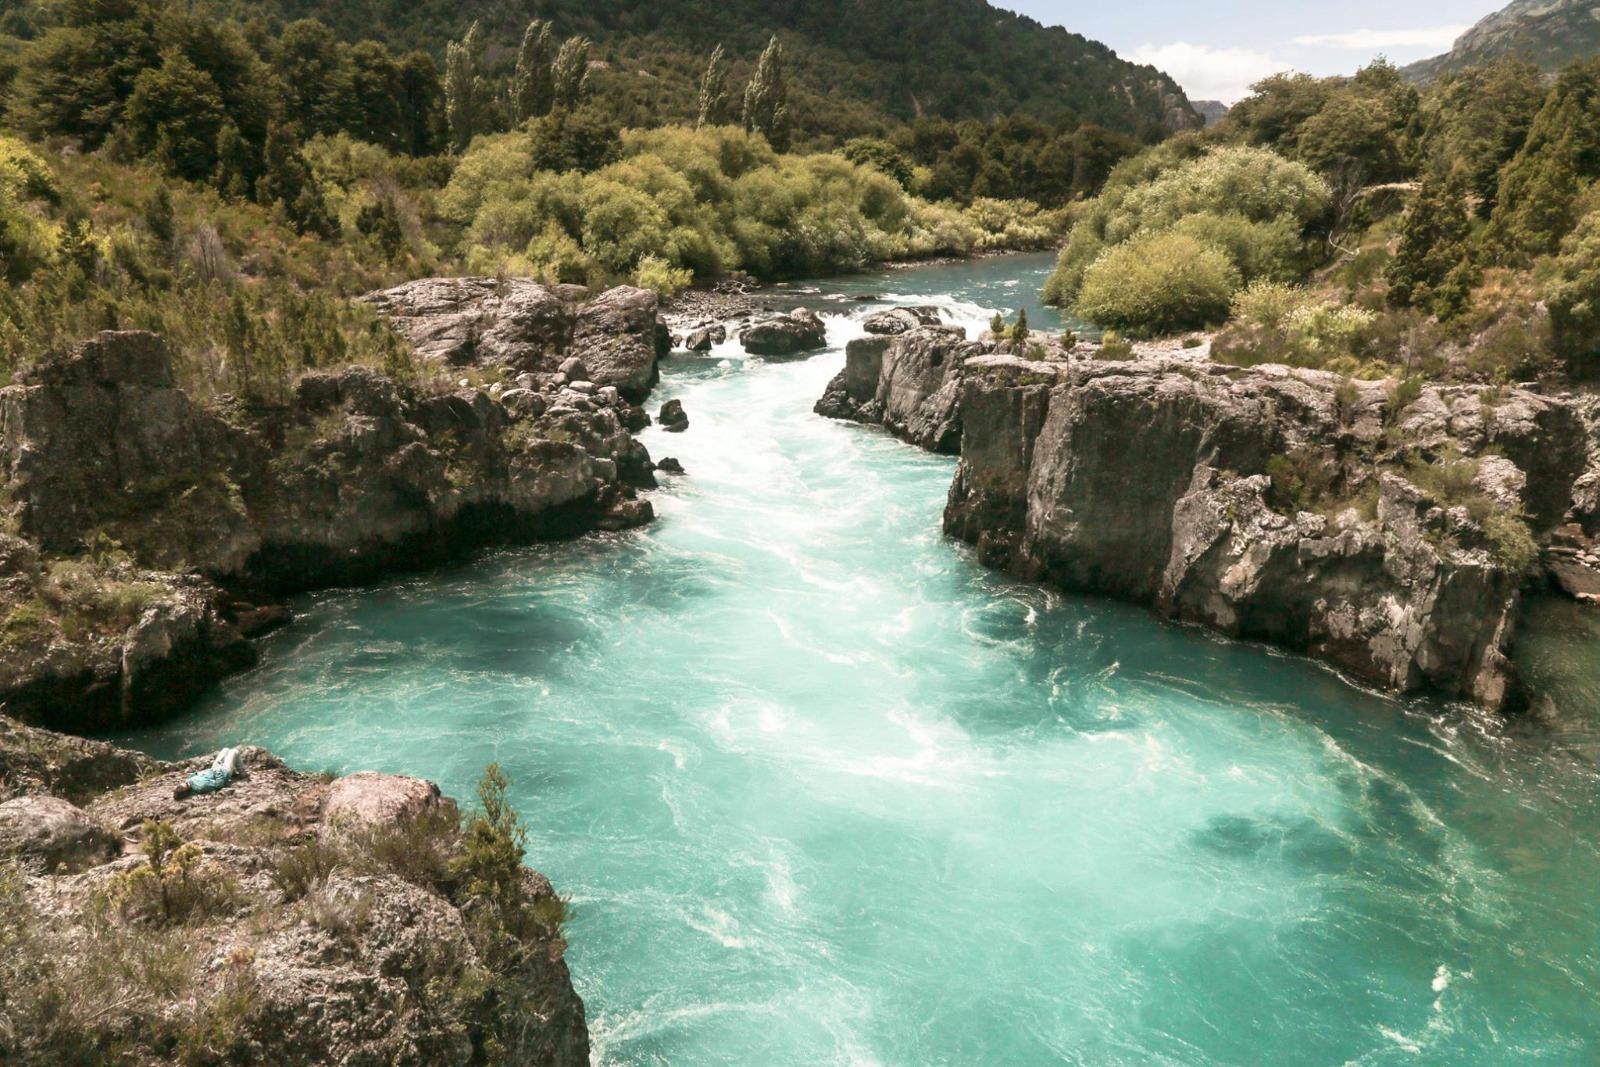 Travesía Rafting 3 días Río Futaleufú